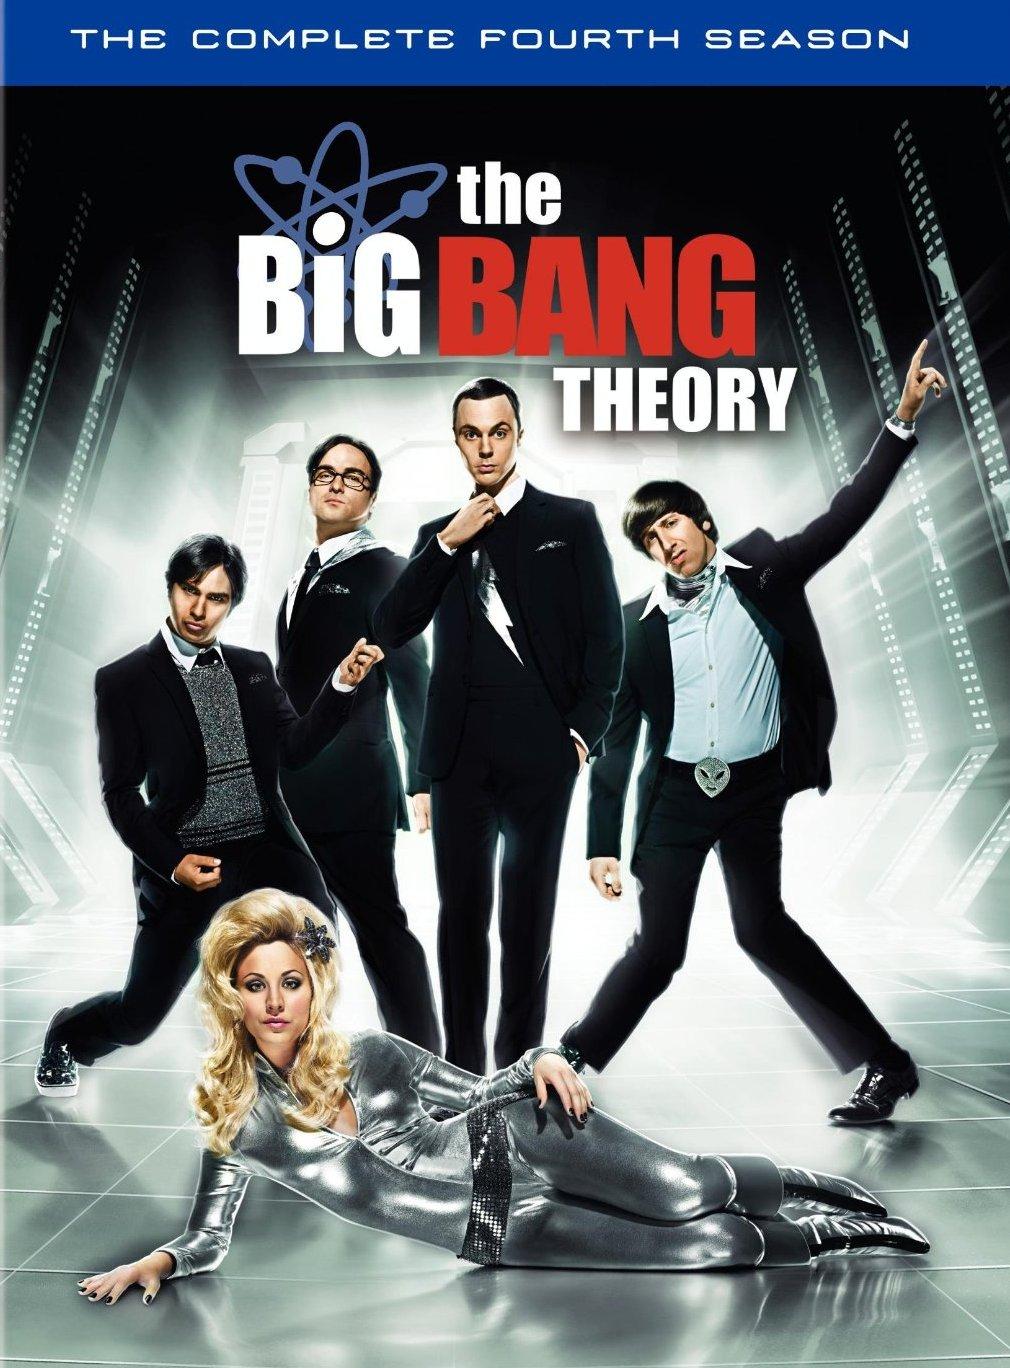 THE BIG BANG THEORY SEASON 4 | © 2011 Warner Home Video